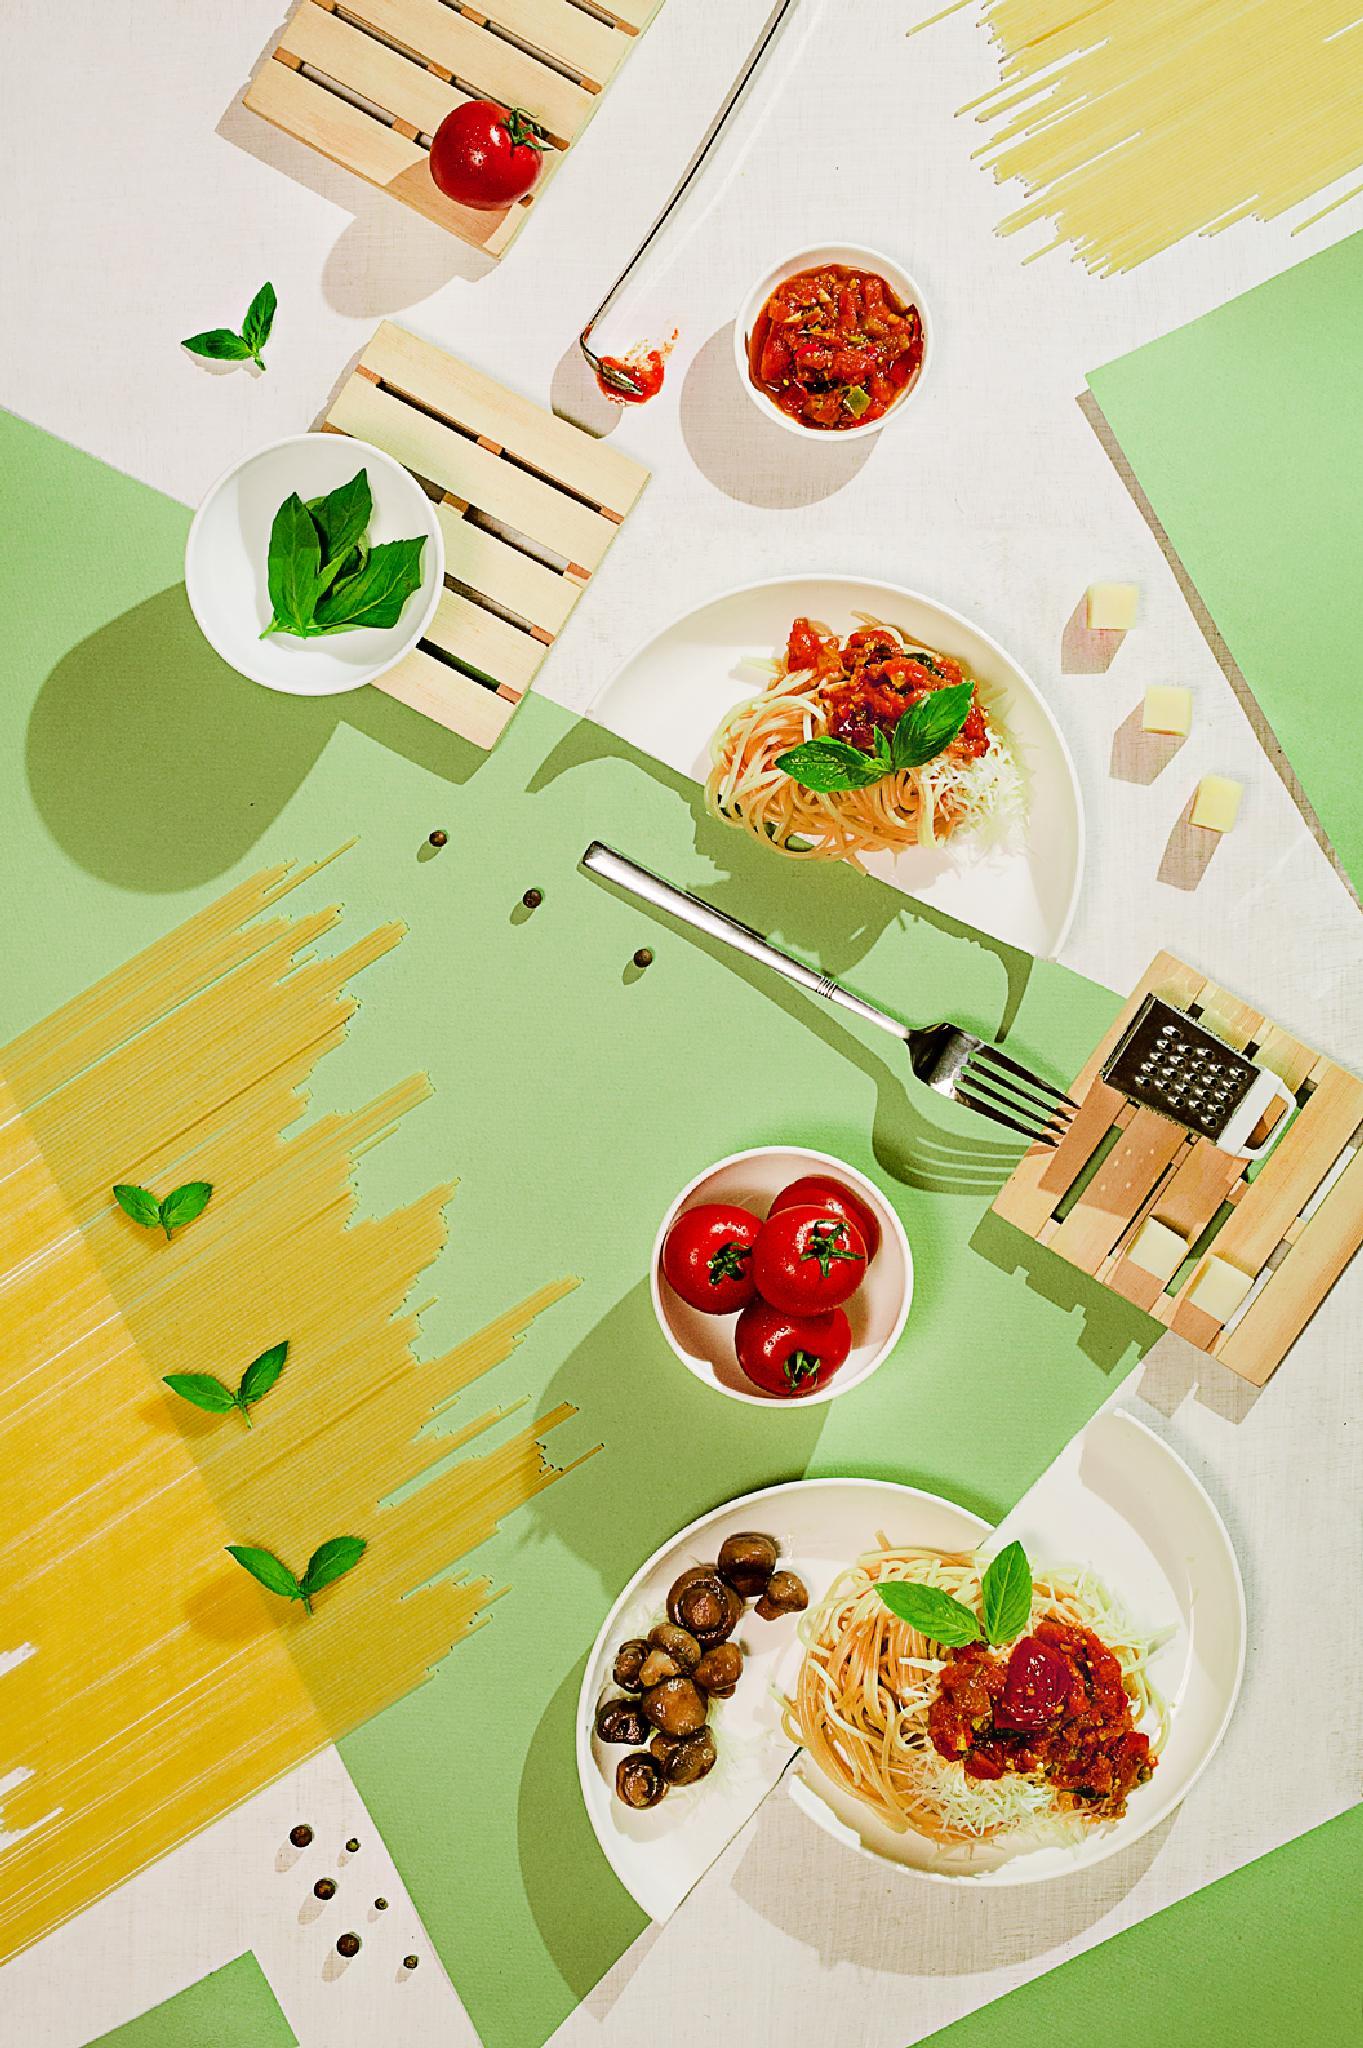 Suprematic meal by Dina Belenko